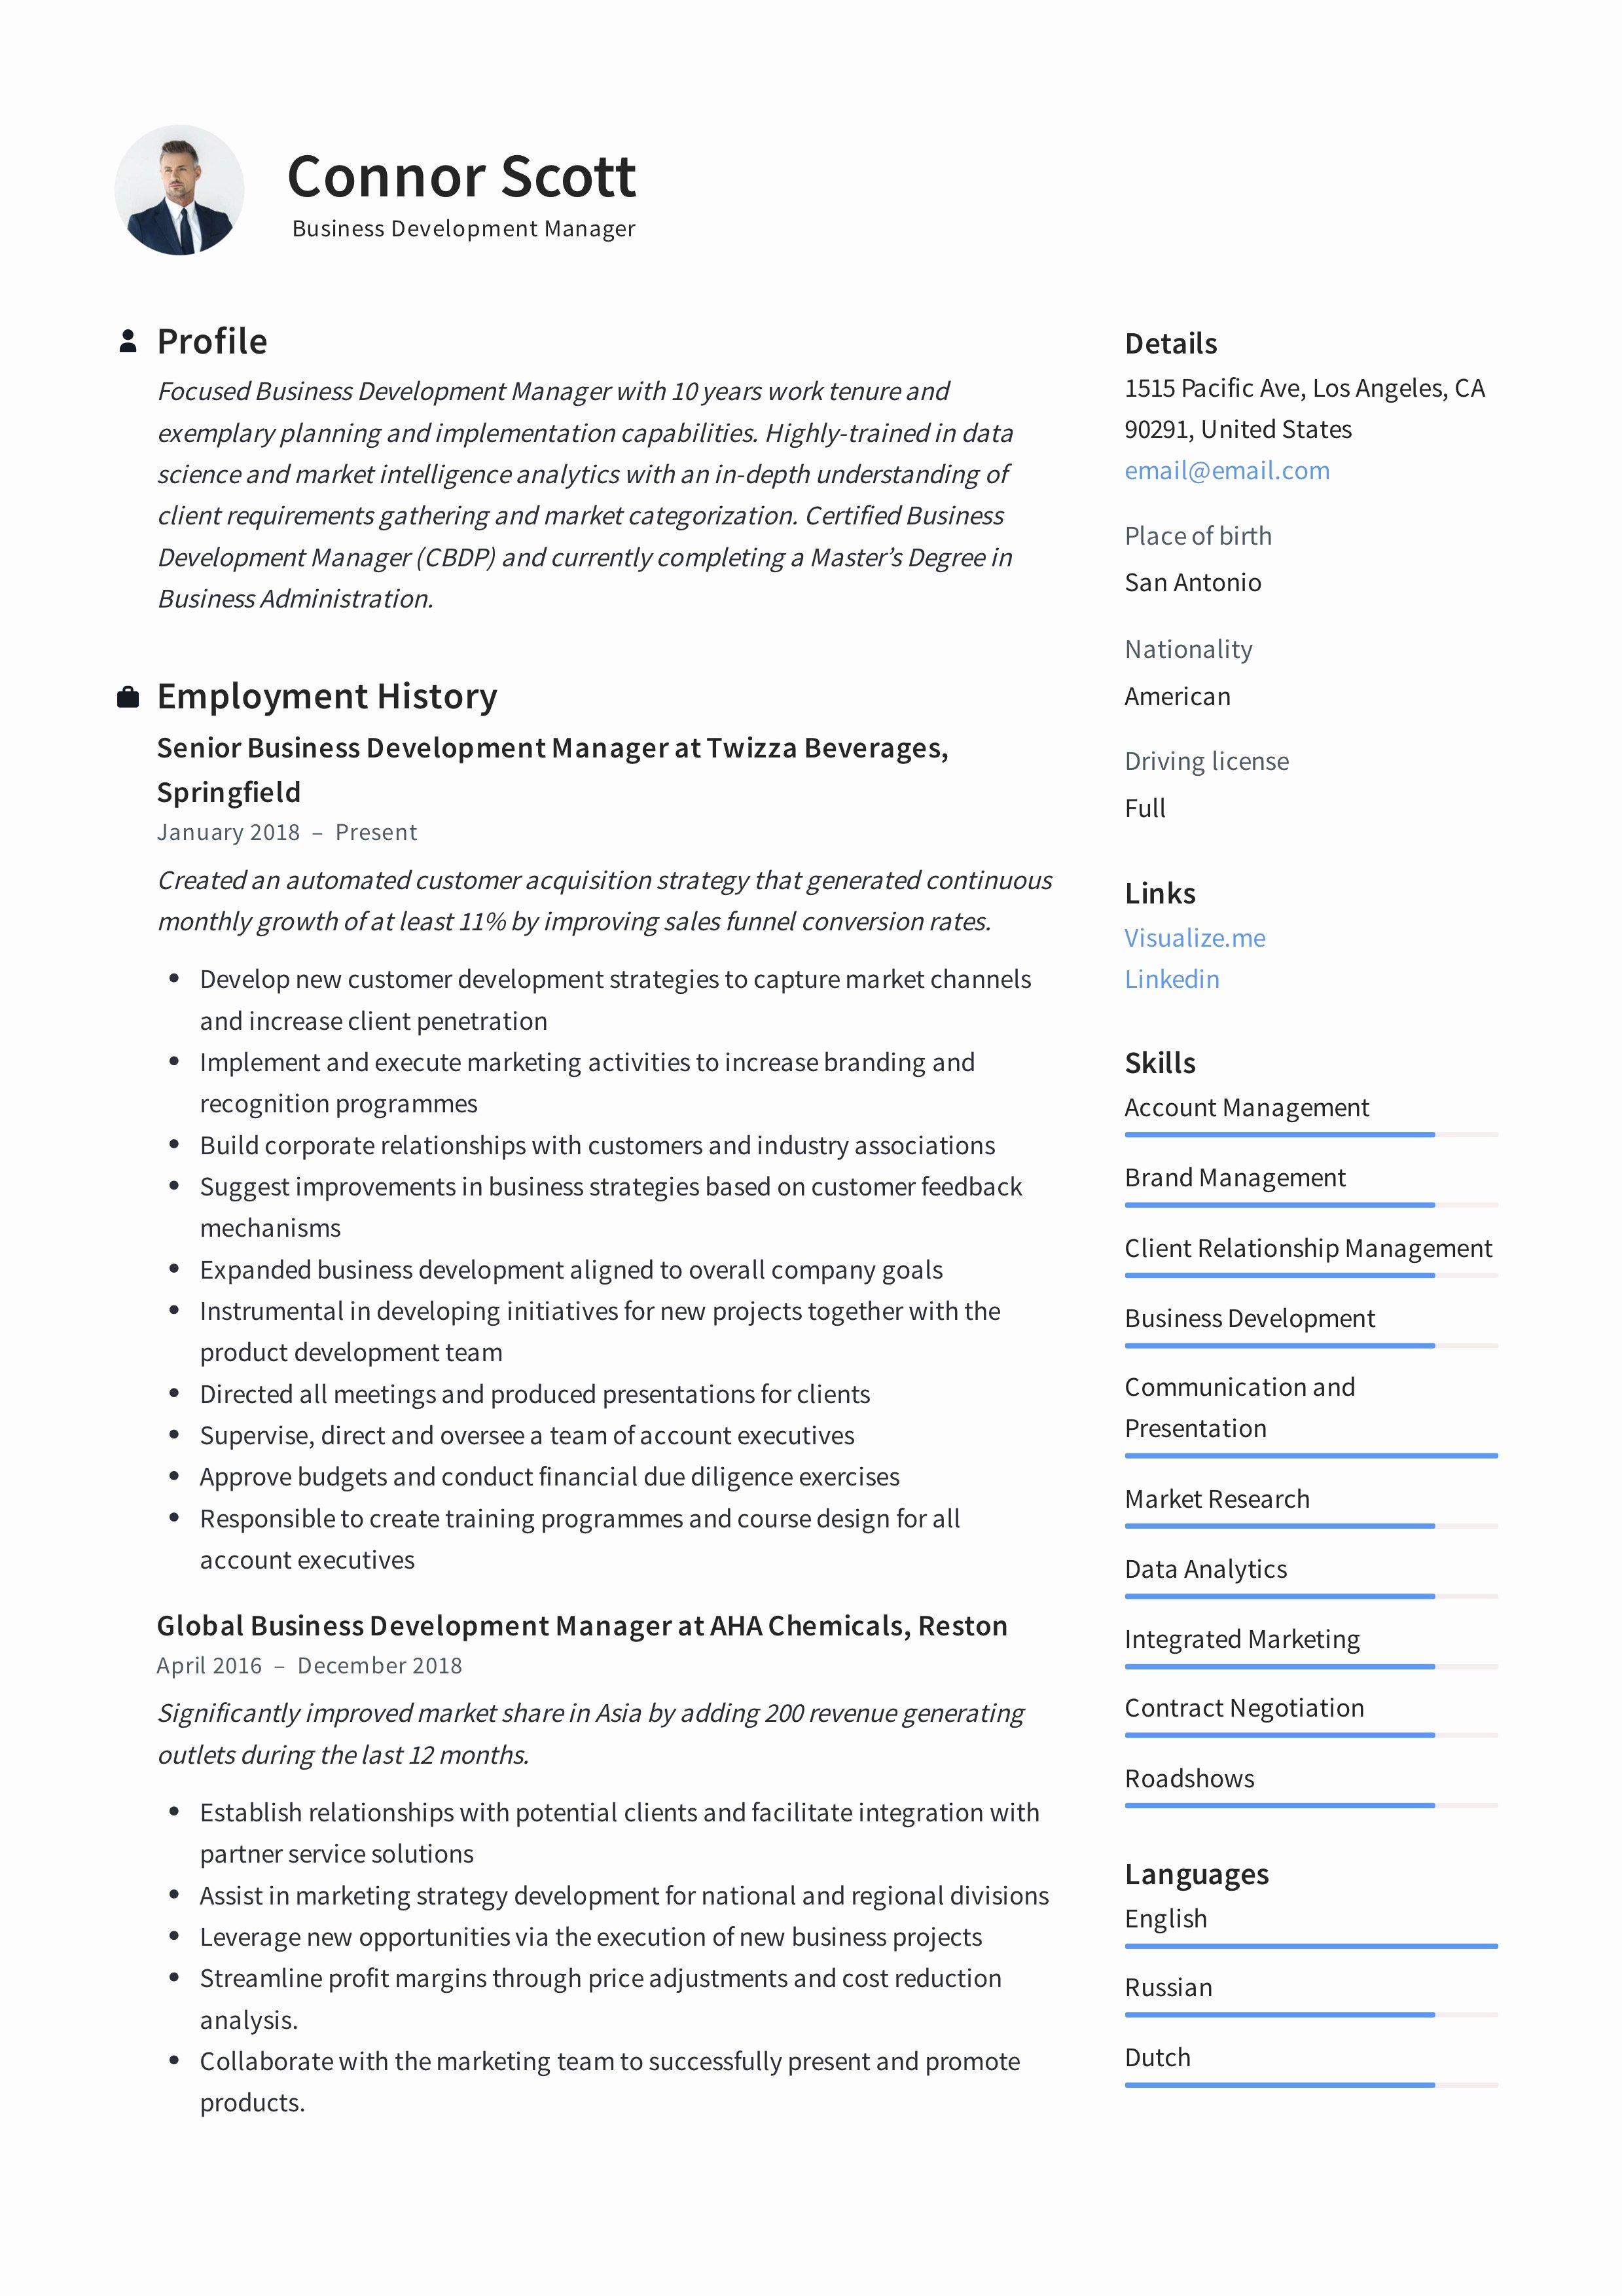 Business Development Manager Resume Unique Business Development Manager Resume & Guide